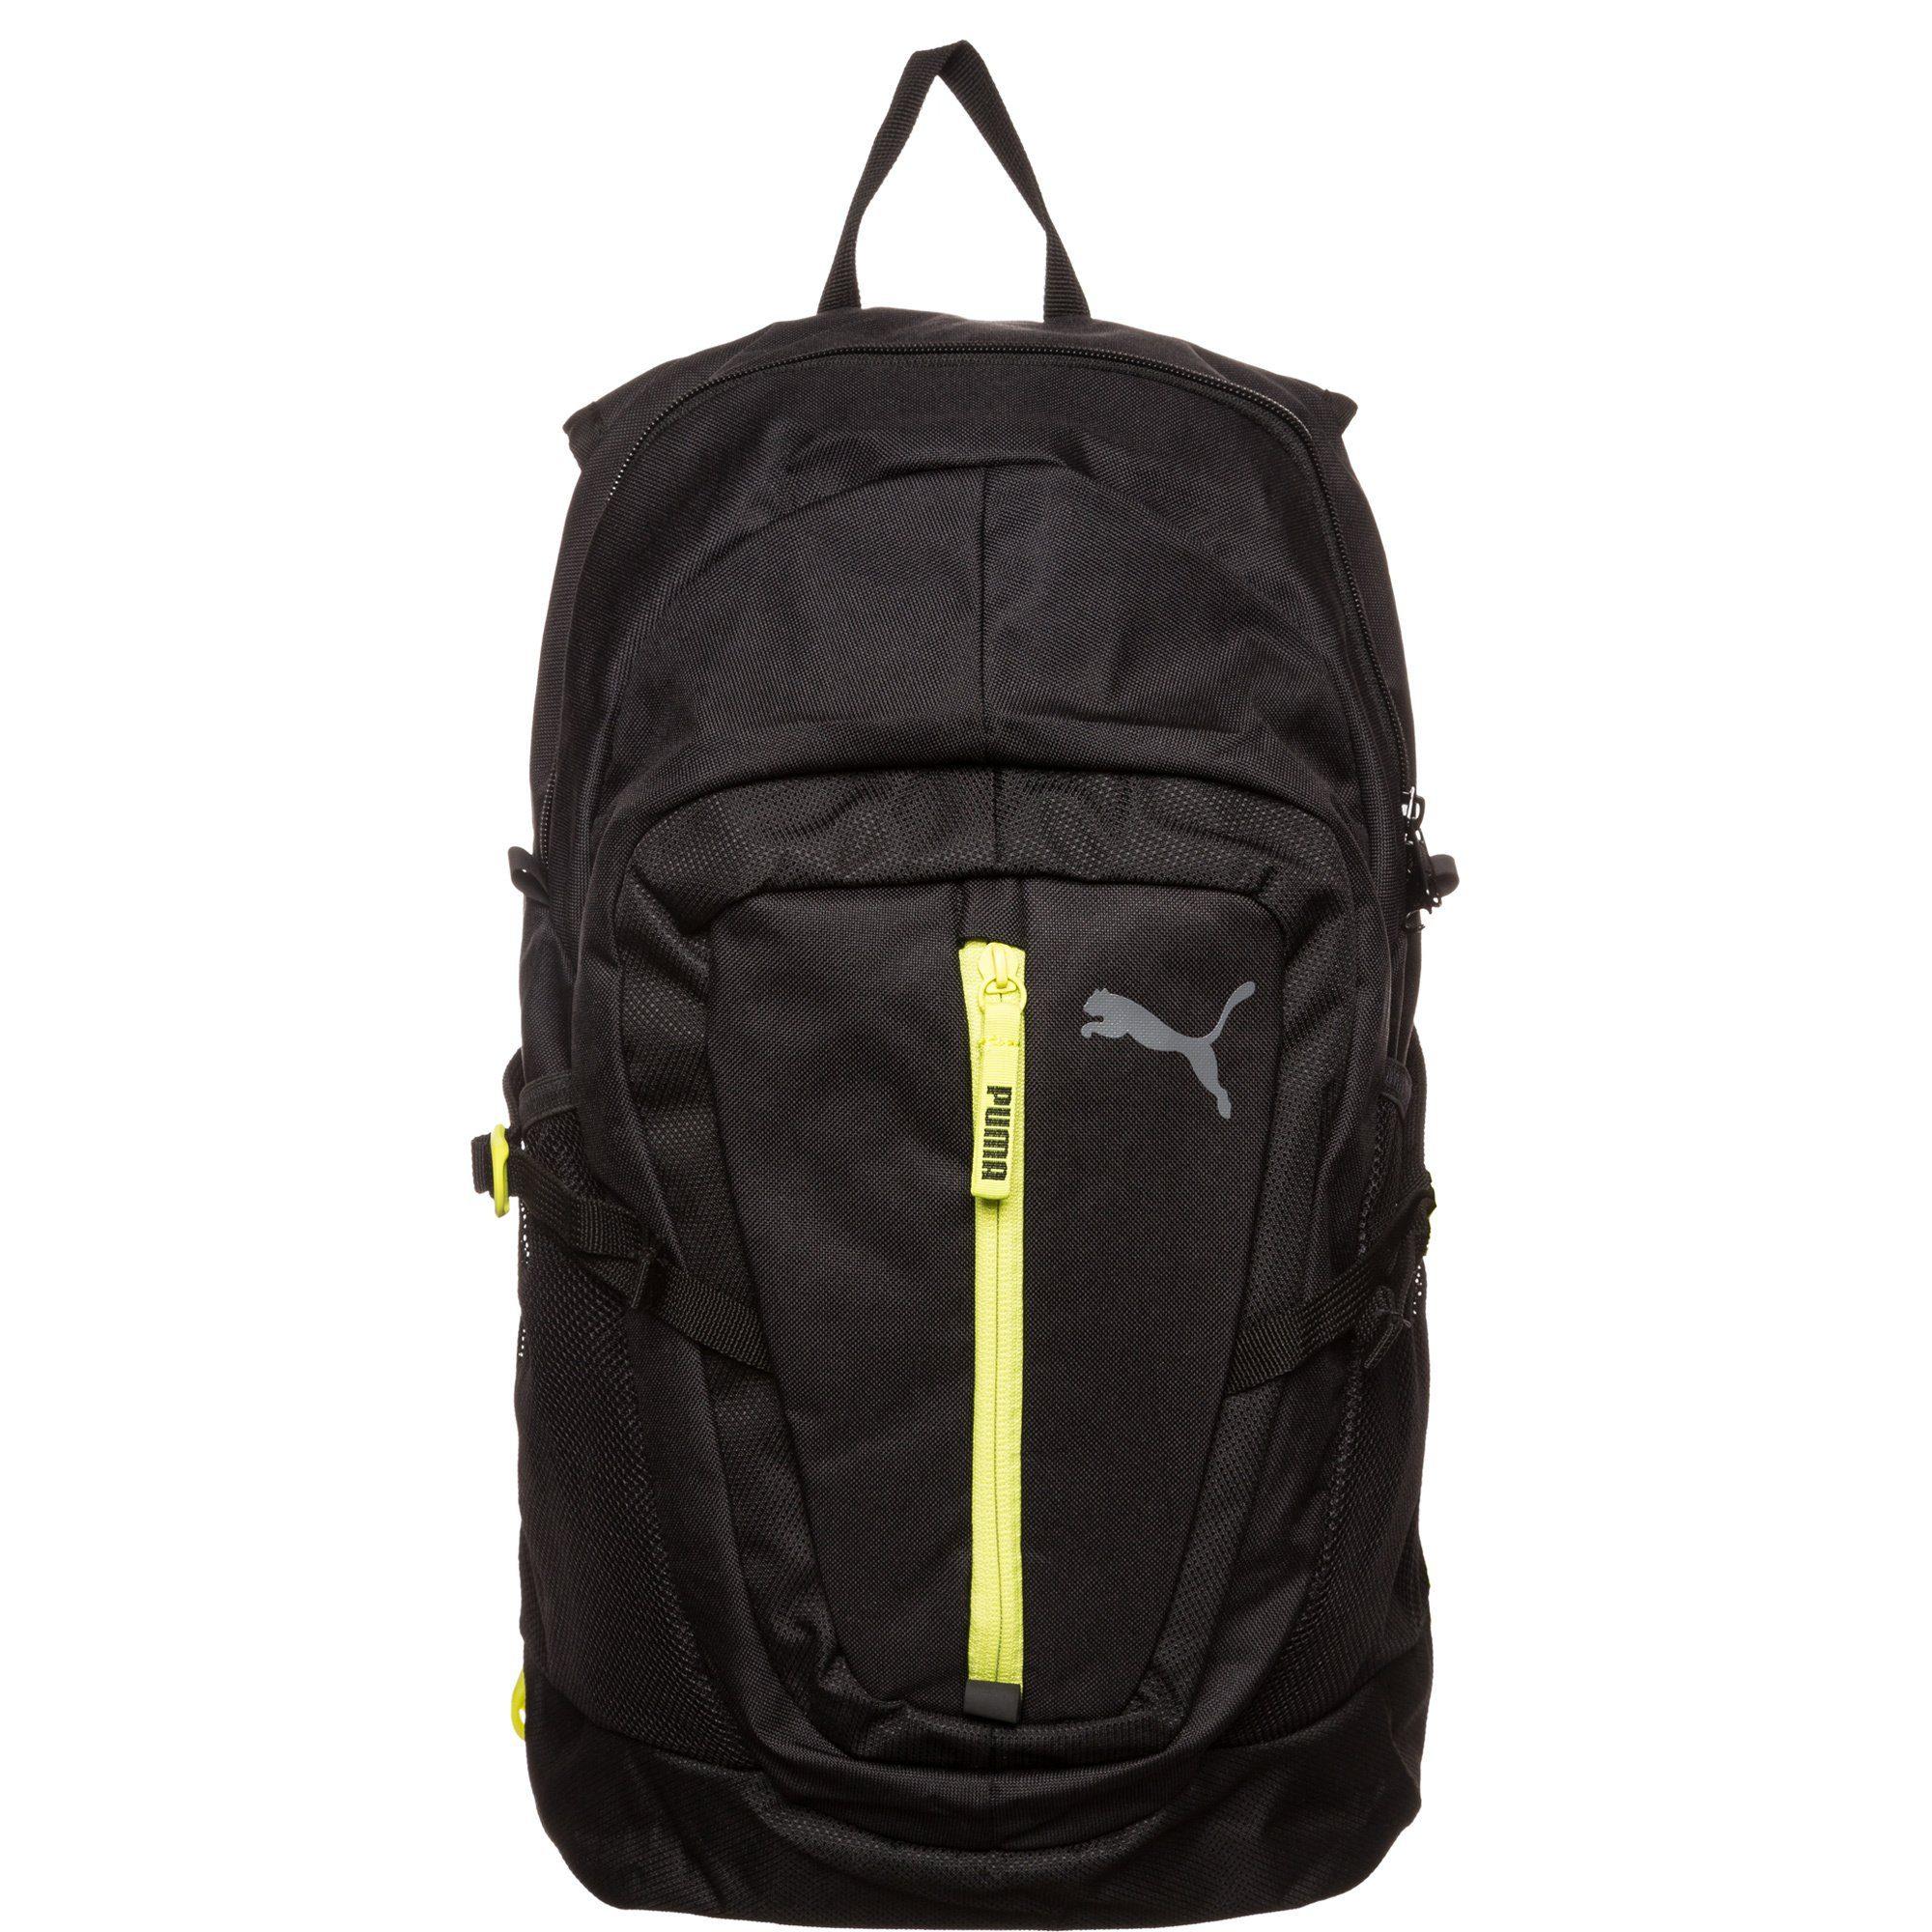 PUMA Sportrucksack »Apex Pacer«